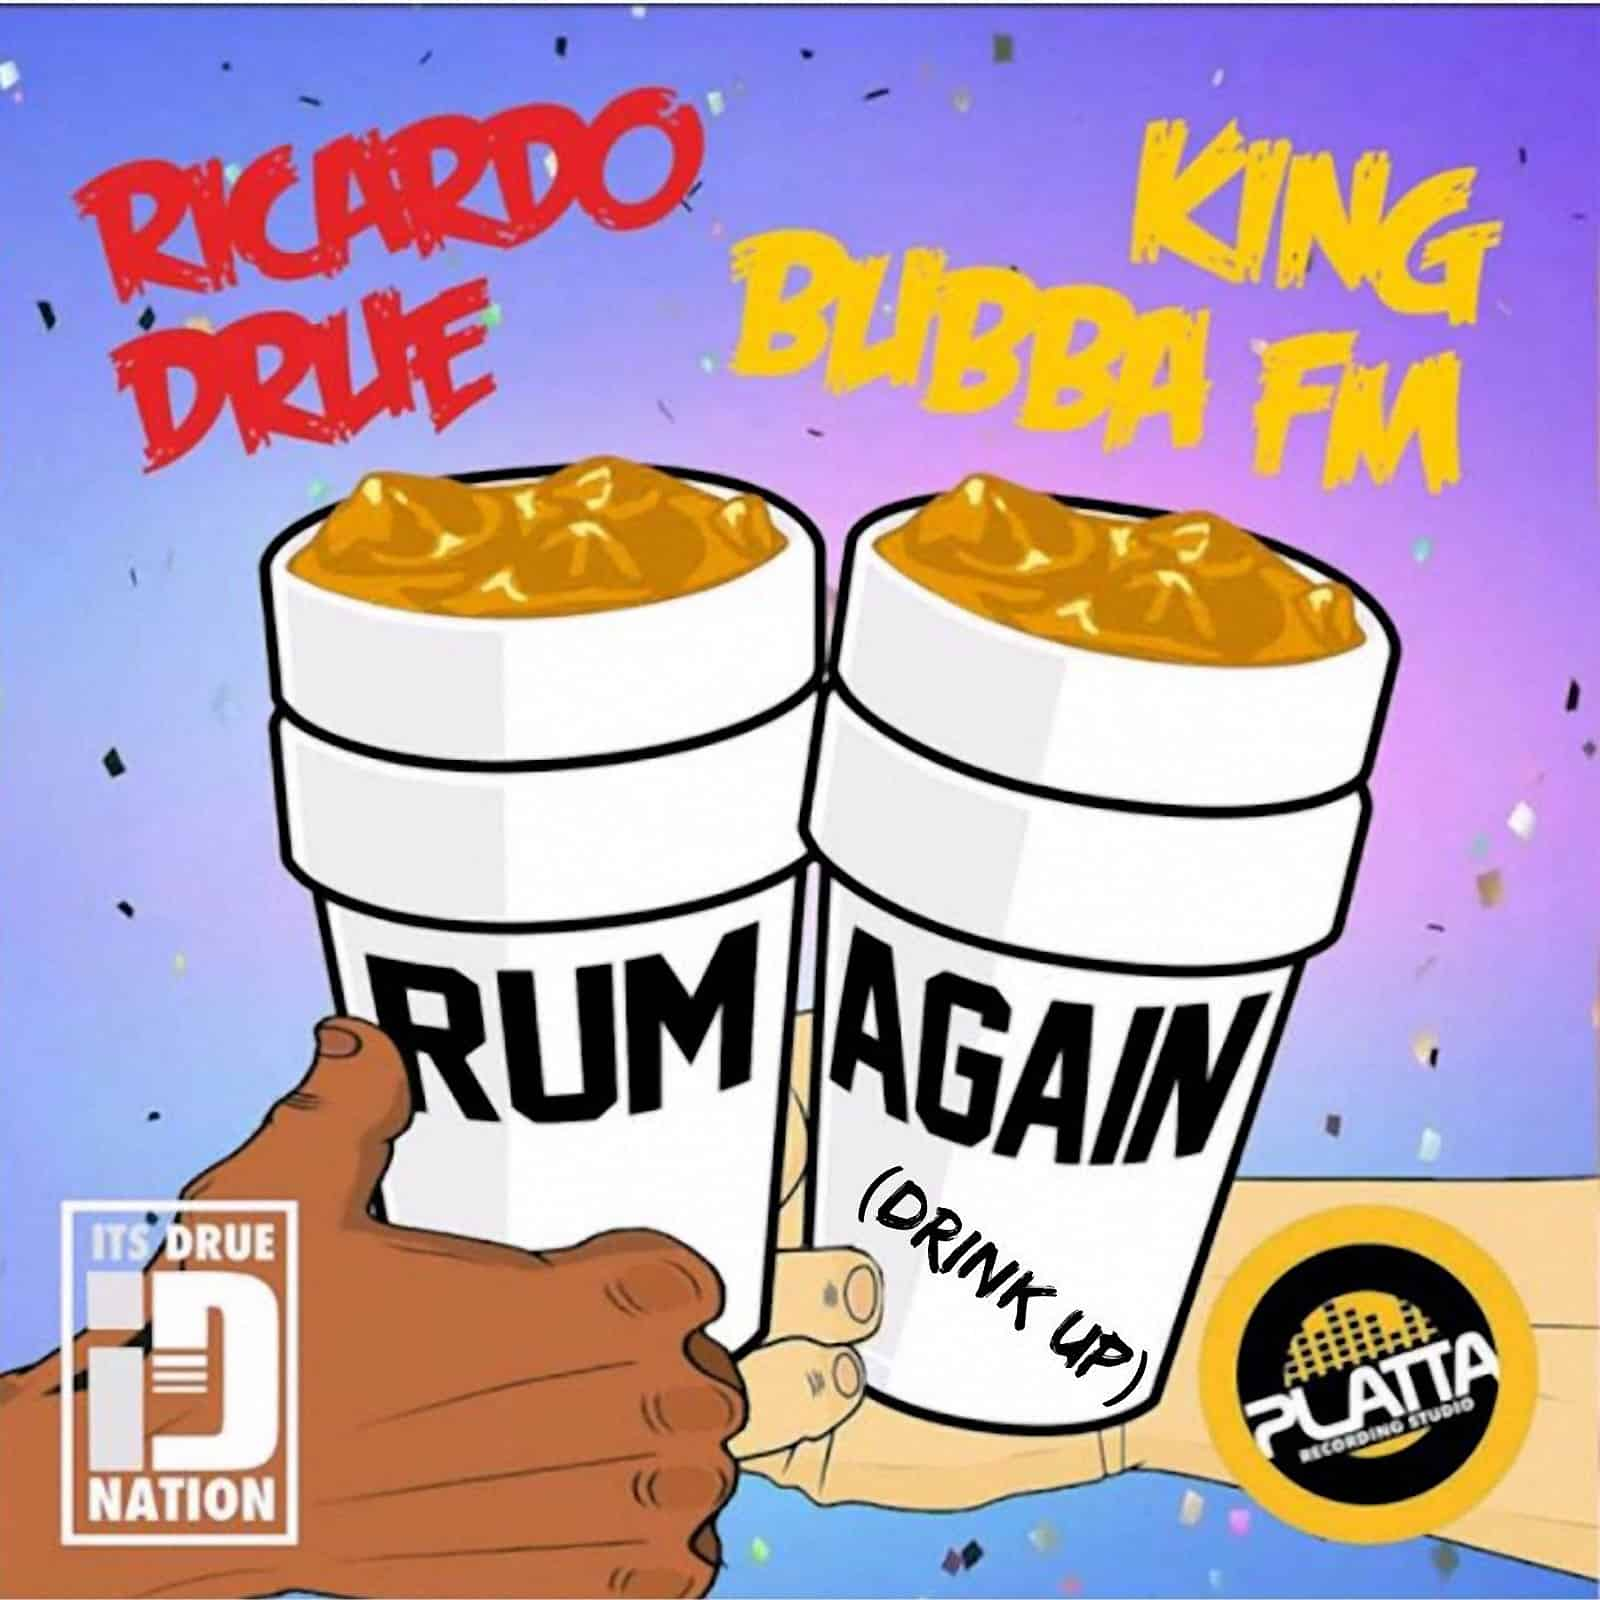 Ricardo Drue & King Bubba FM - Rum Again (Drink Up)